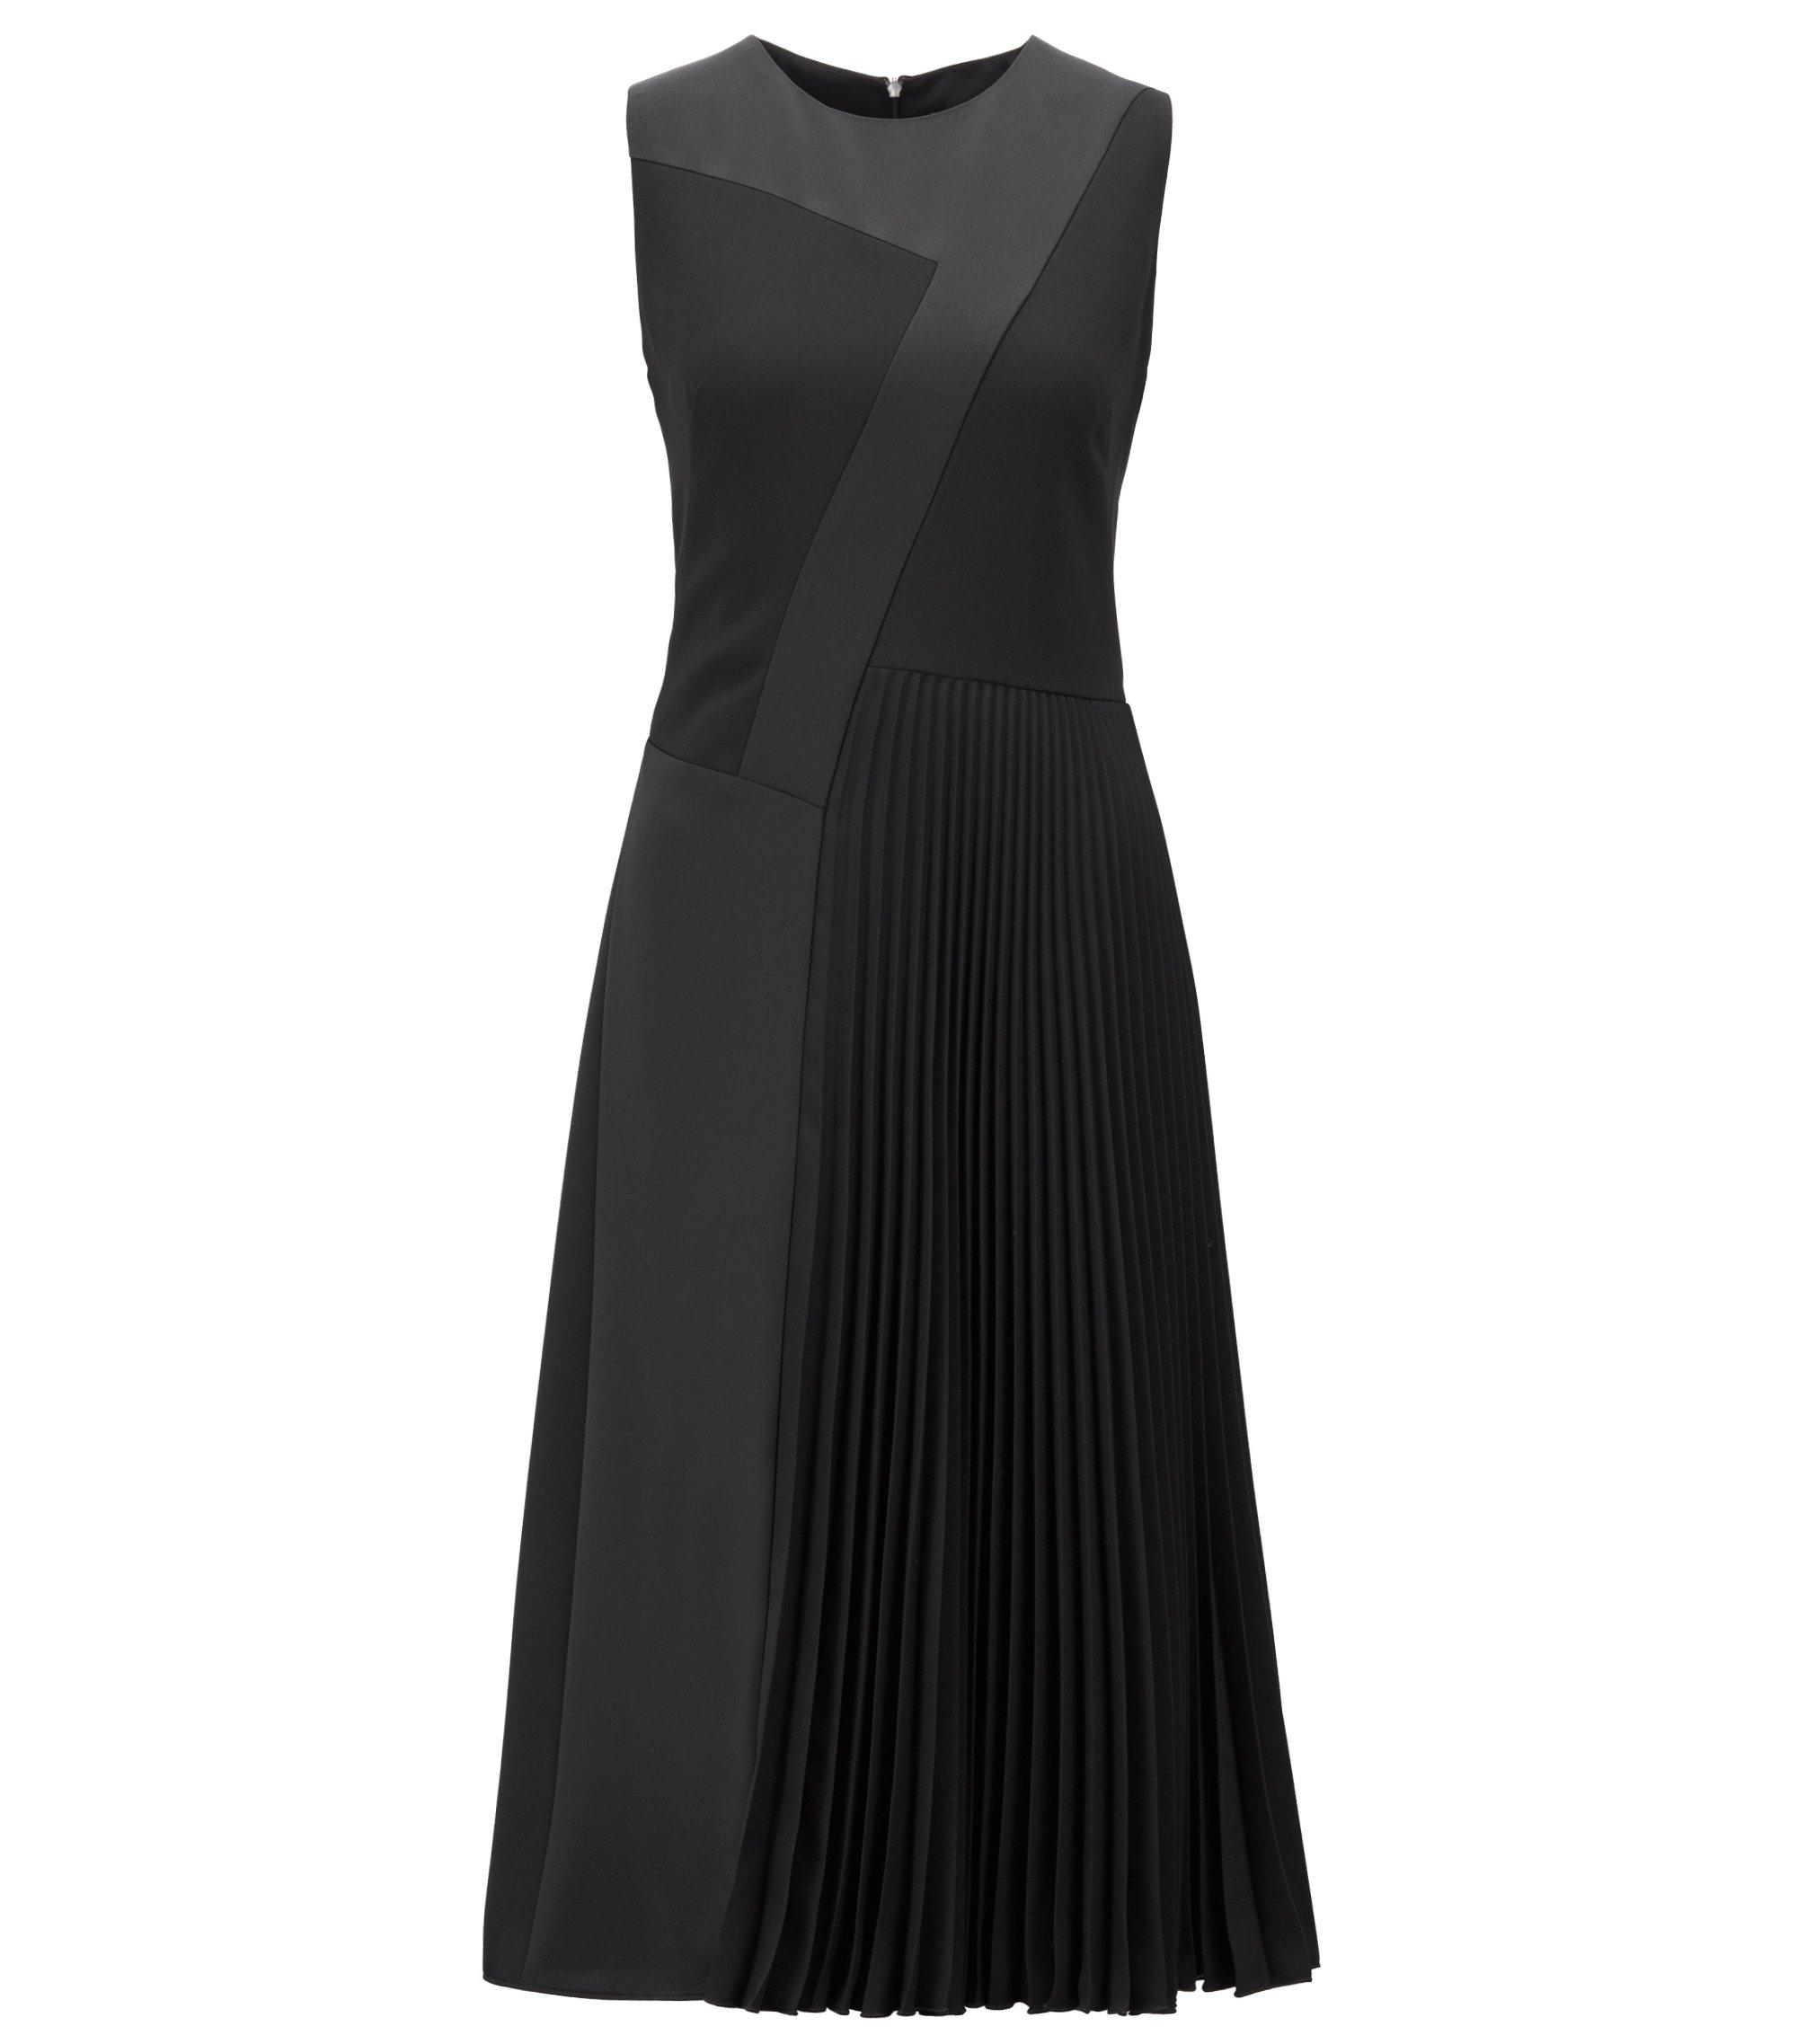 Midi-jurk in patchwork-crêpe met plissédetail in de rok, Zwart